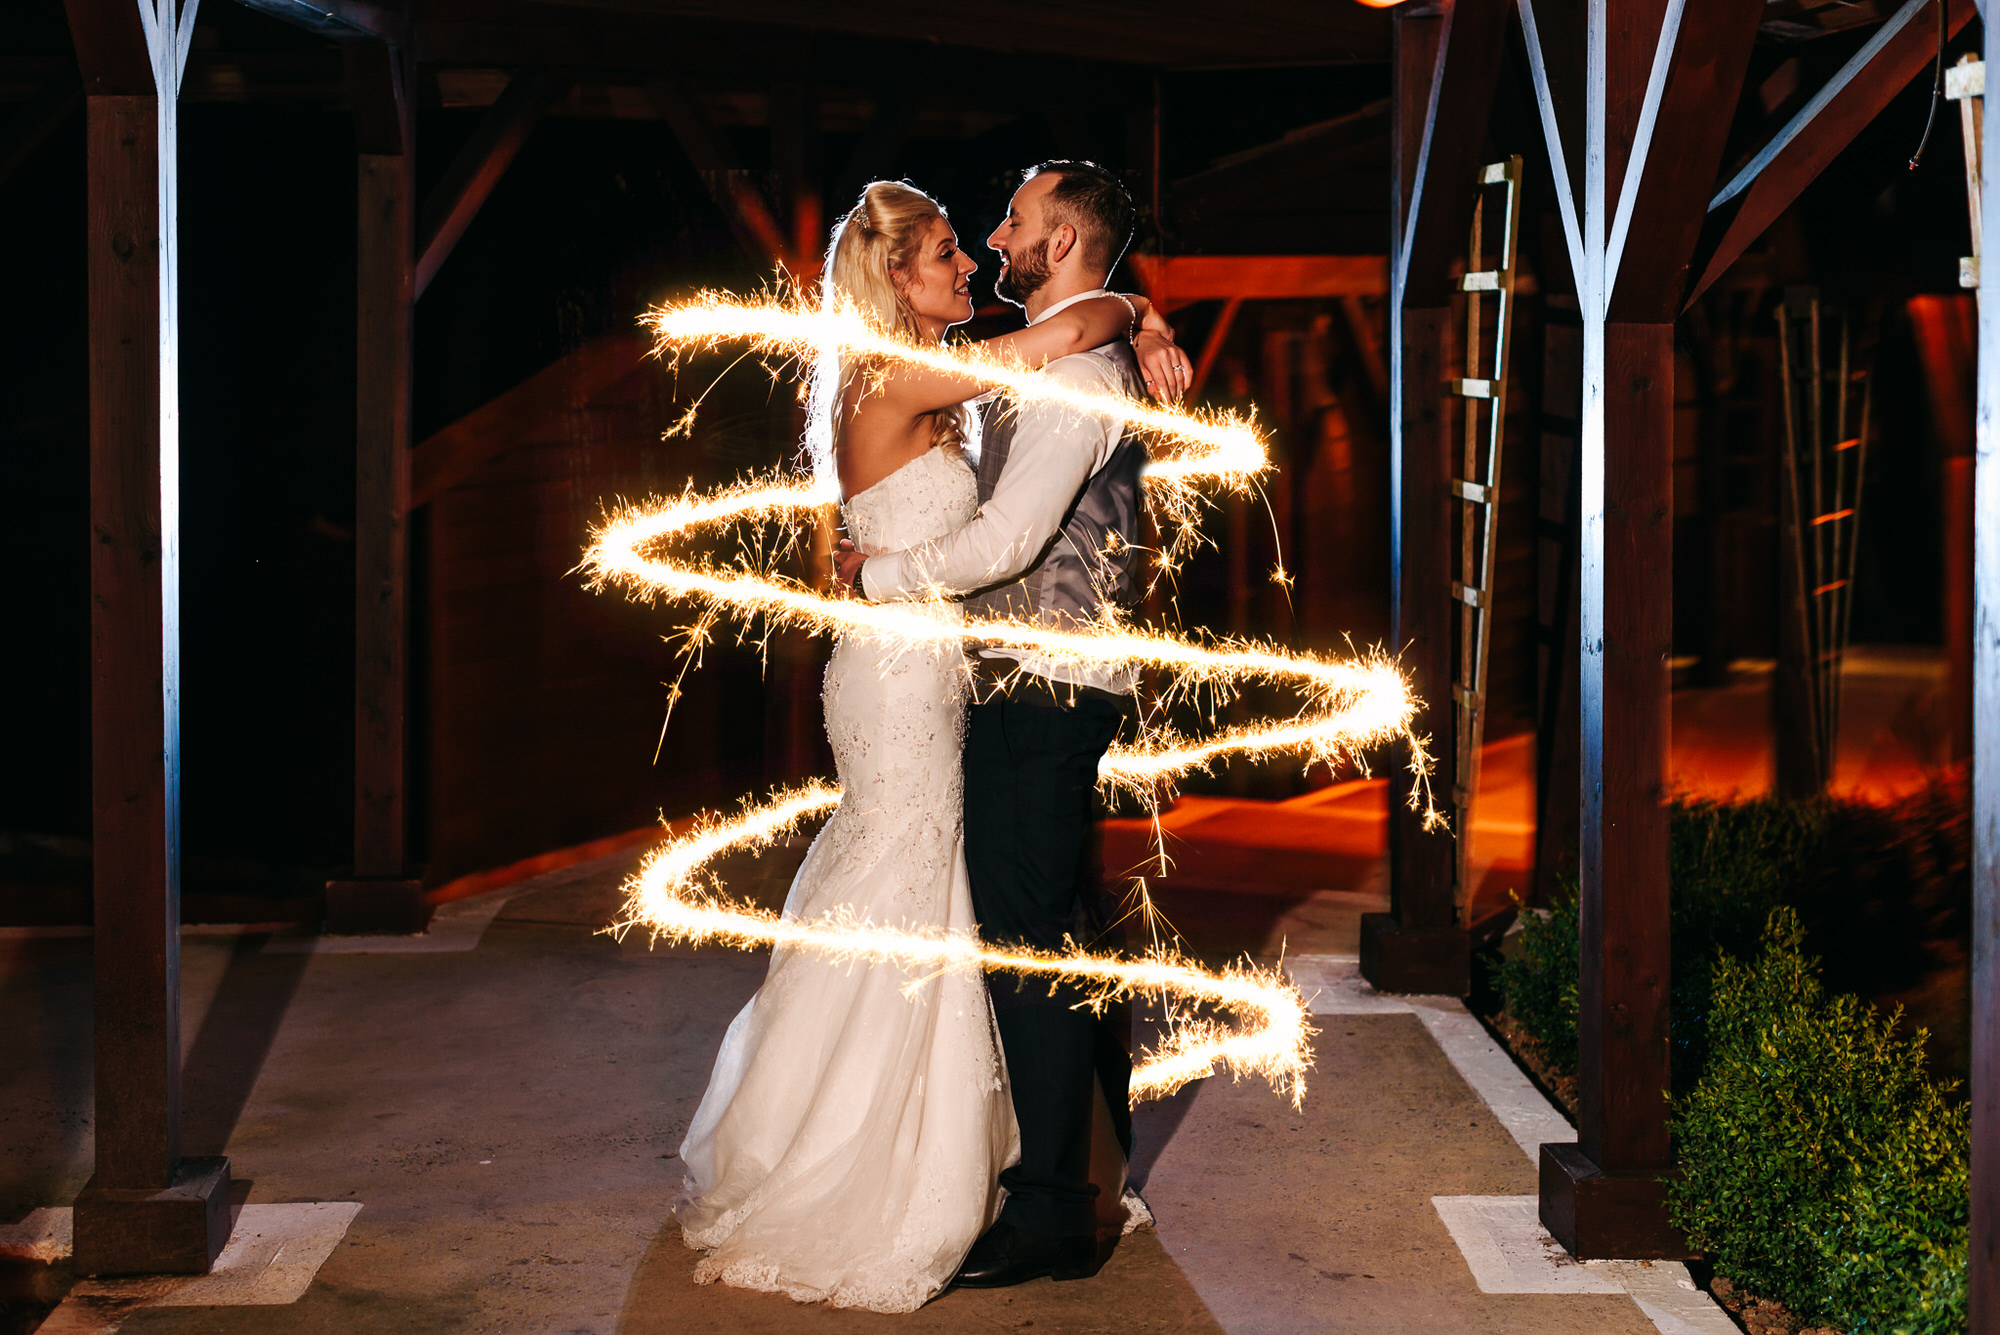 Best Of Yorkshire Wedding Photography 2017 - Martyn Hand-87.jpg